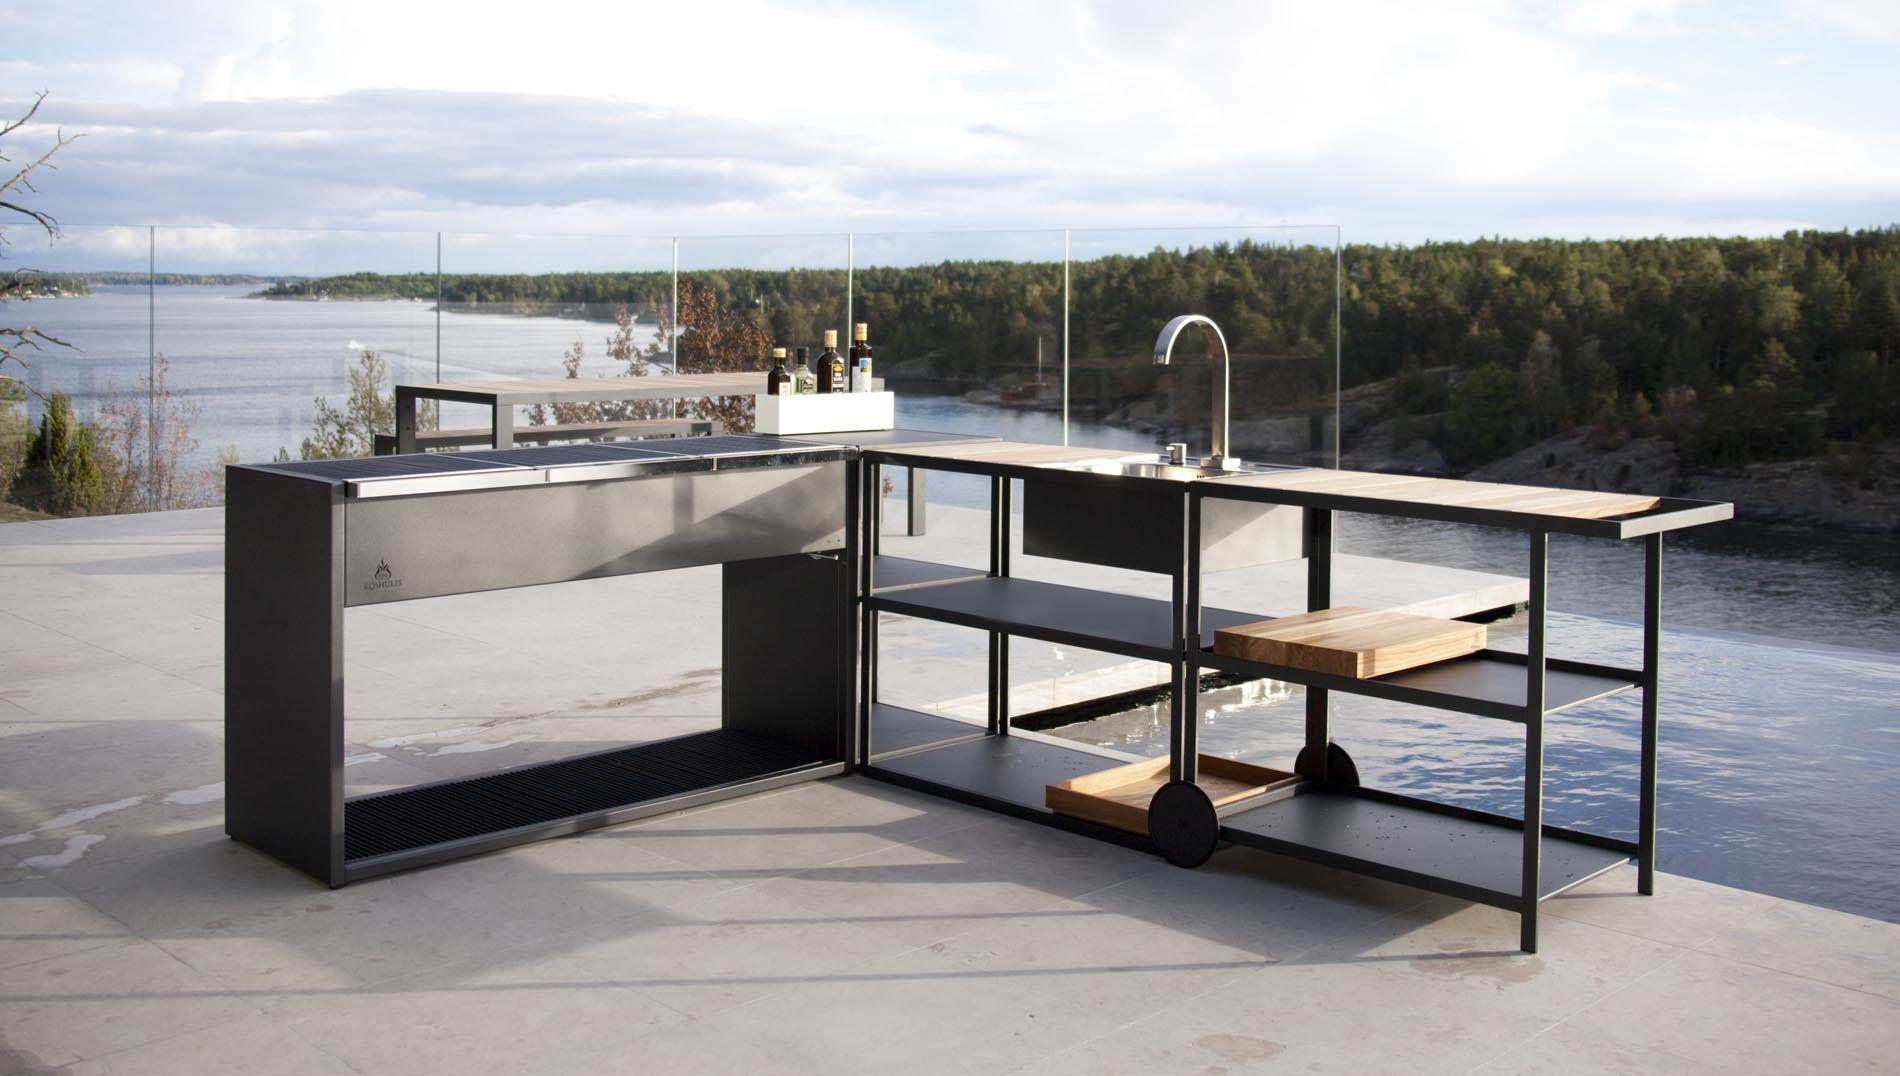 Outdoorküche Napoleon Wikipedia : Roshults outdoor kitchen google zoeken kitchen design in 2018